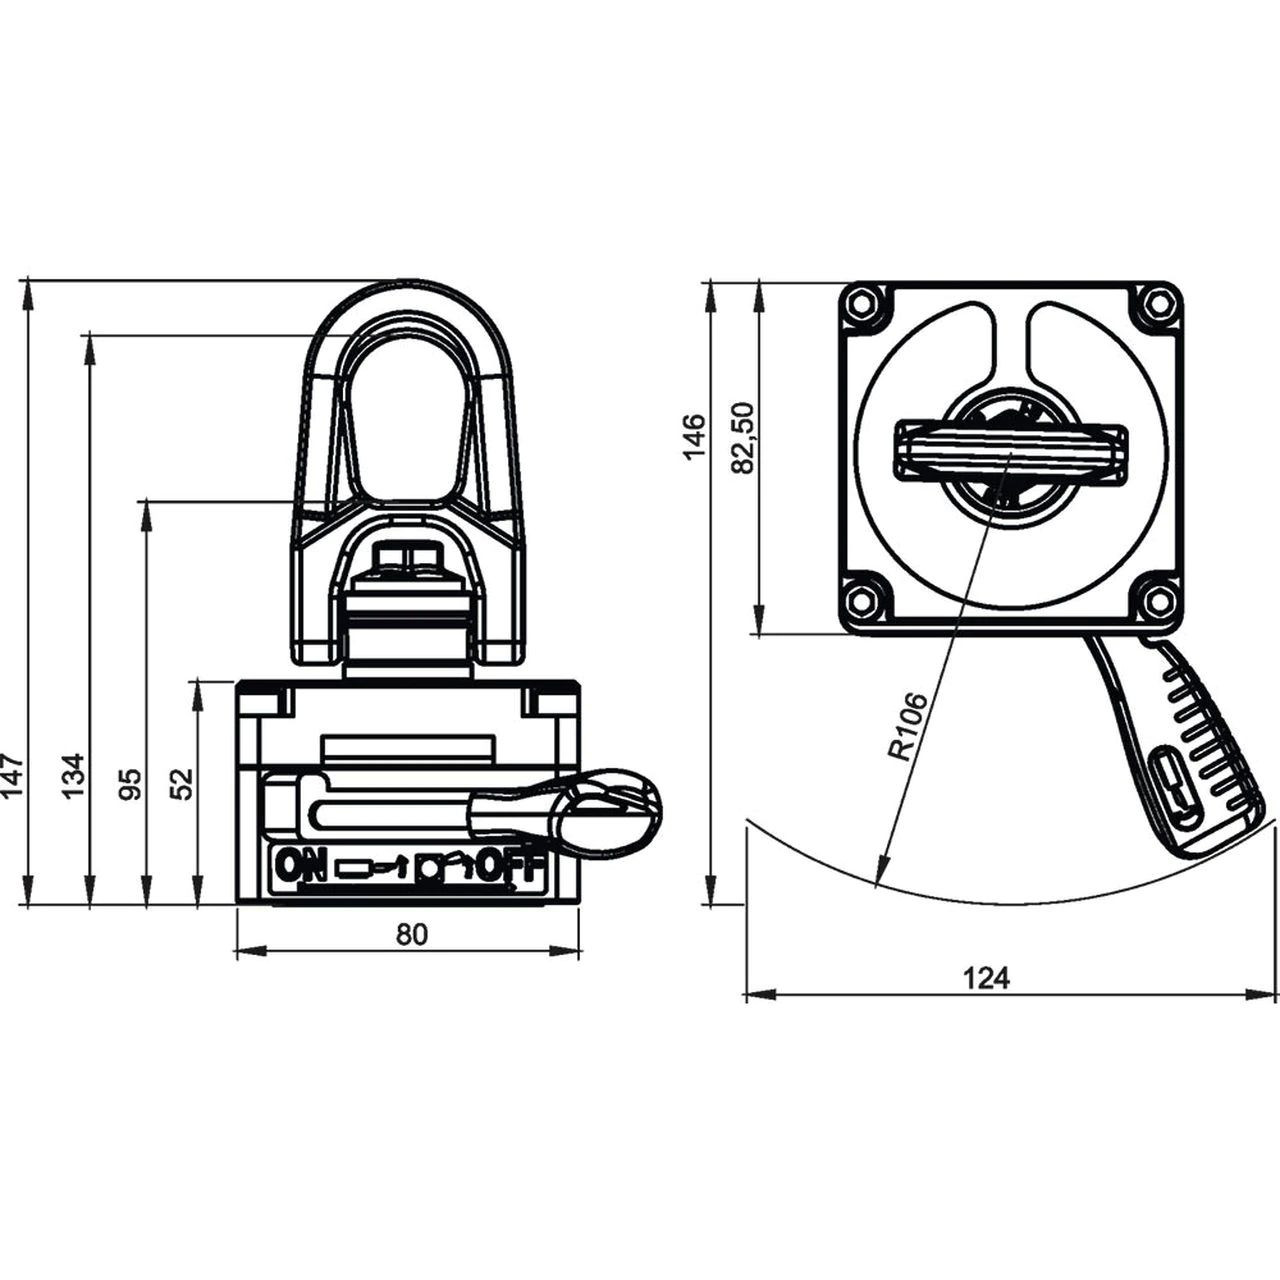 Alfra TML-220 Lifting Magnet Dimensions